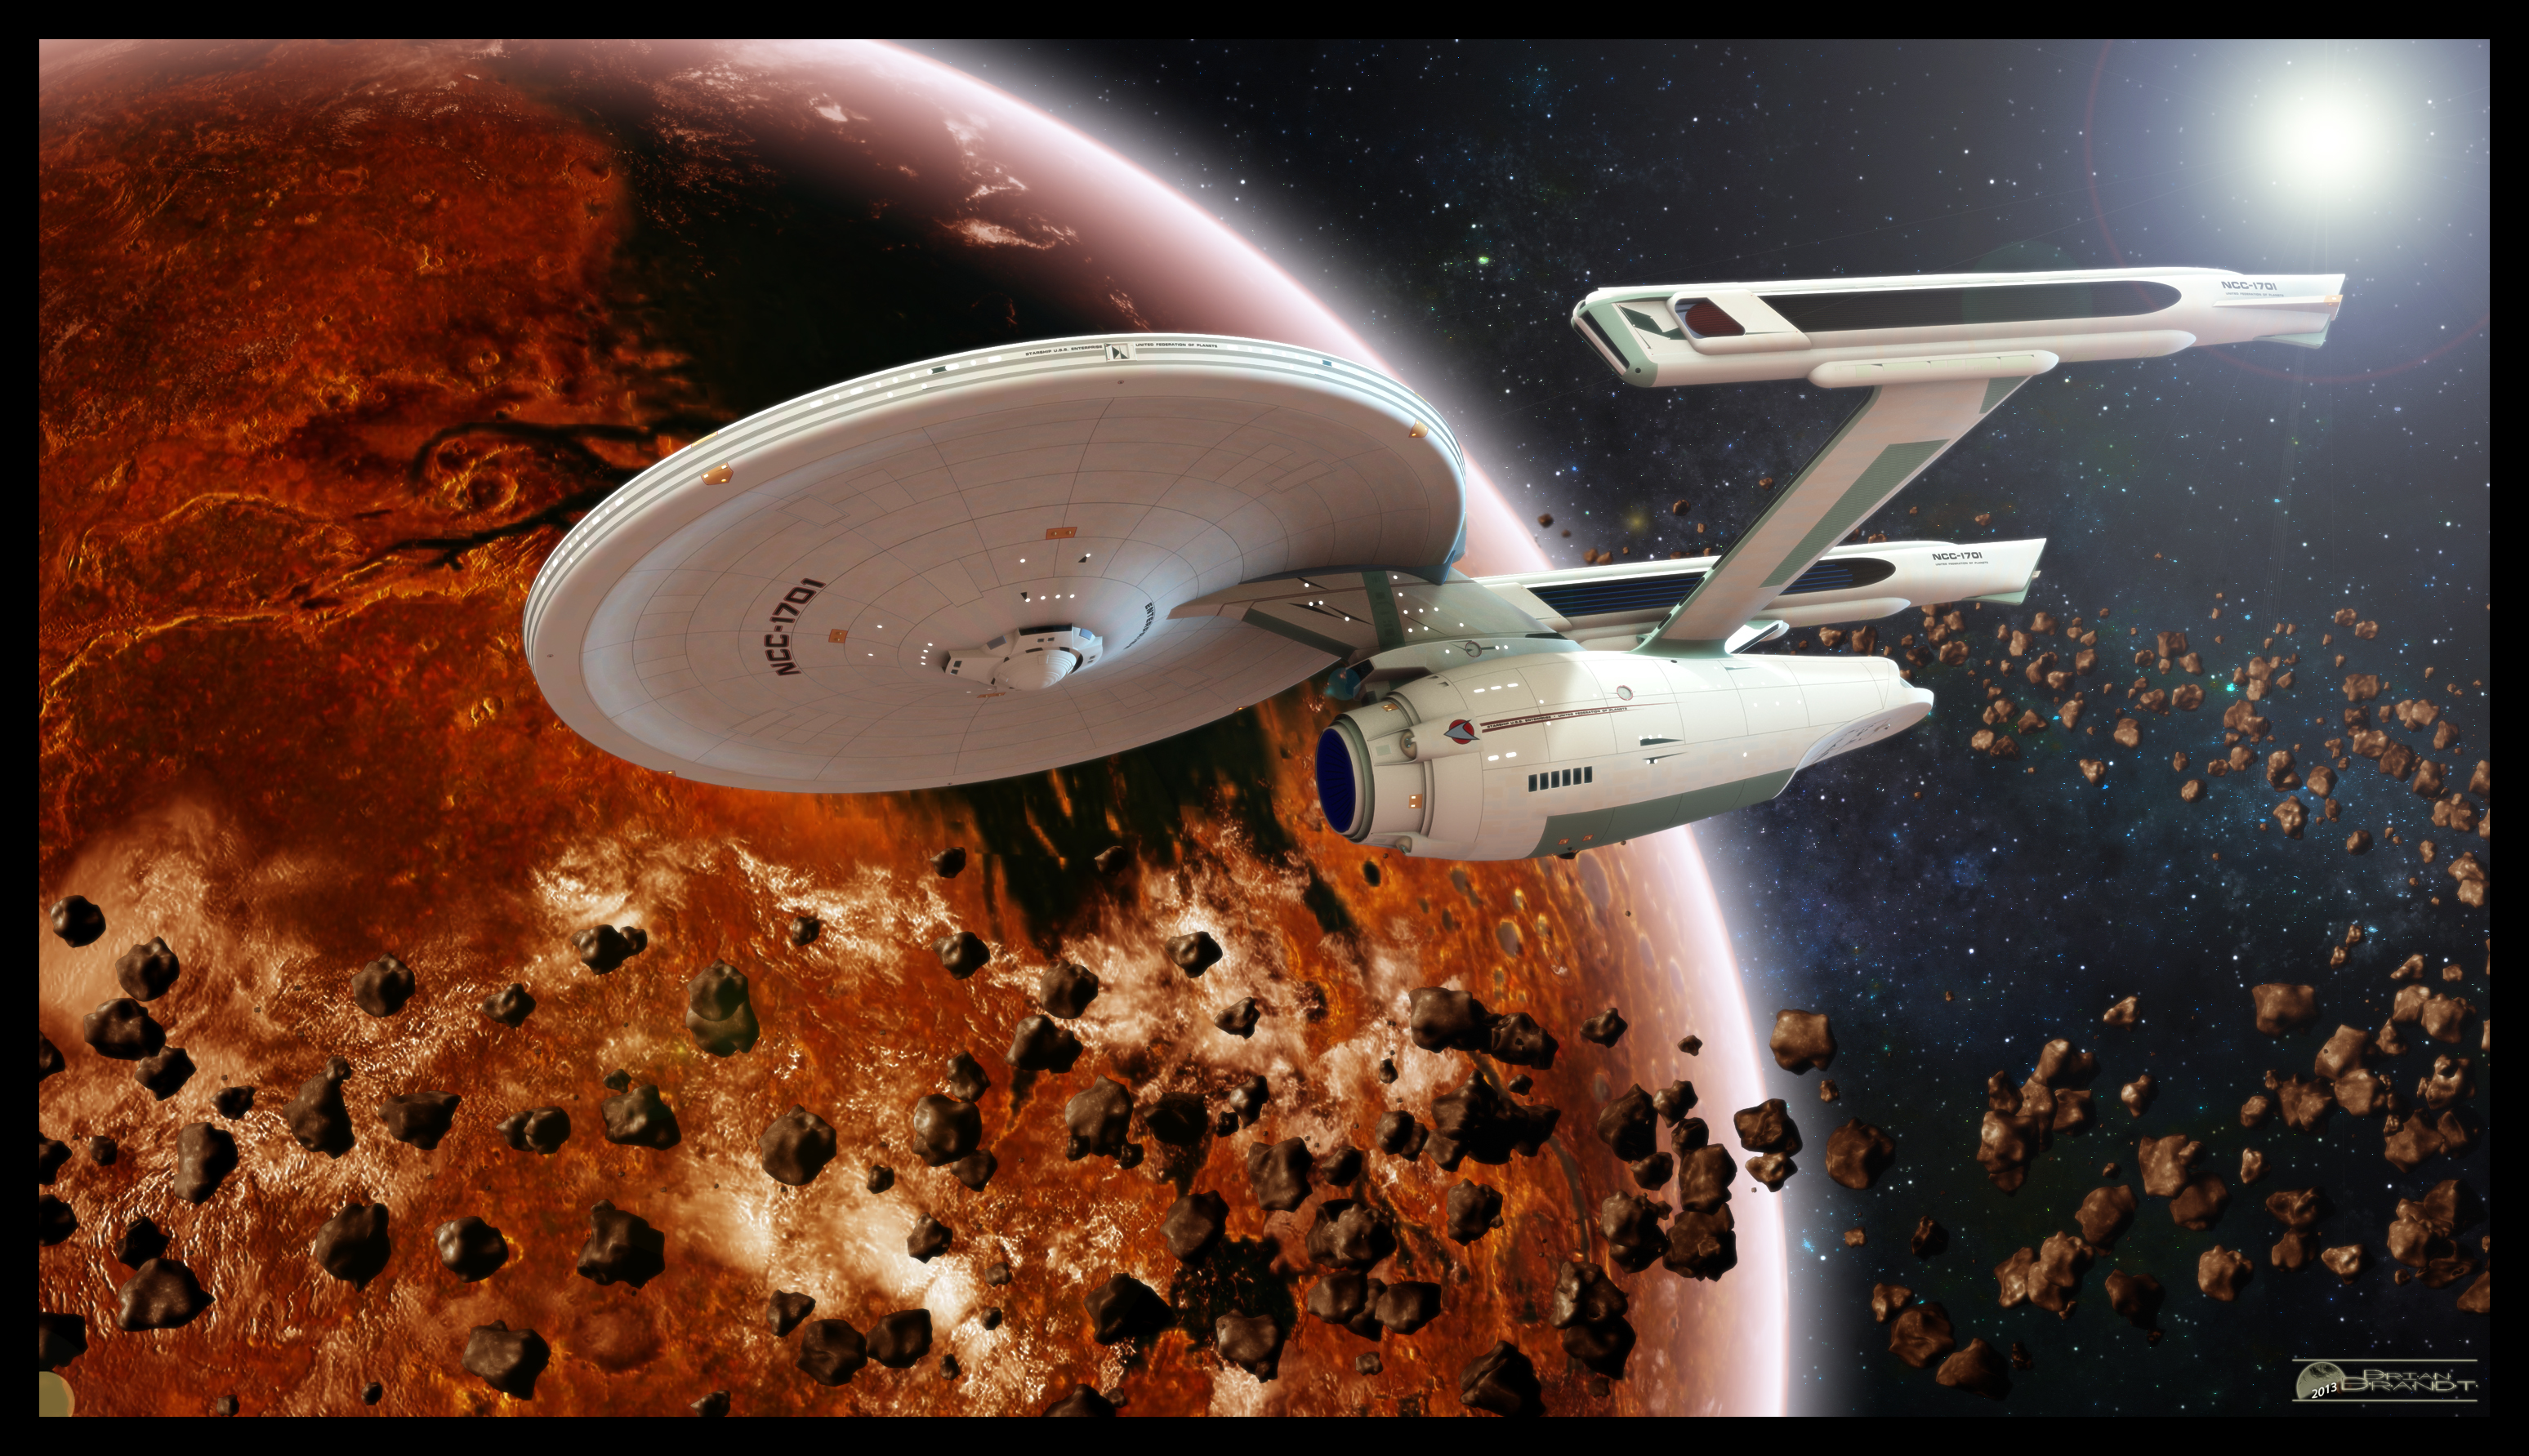 Enterprise entering orbit by MotoTsume